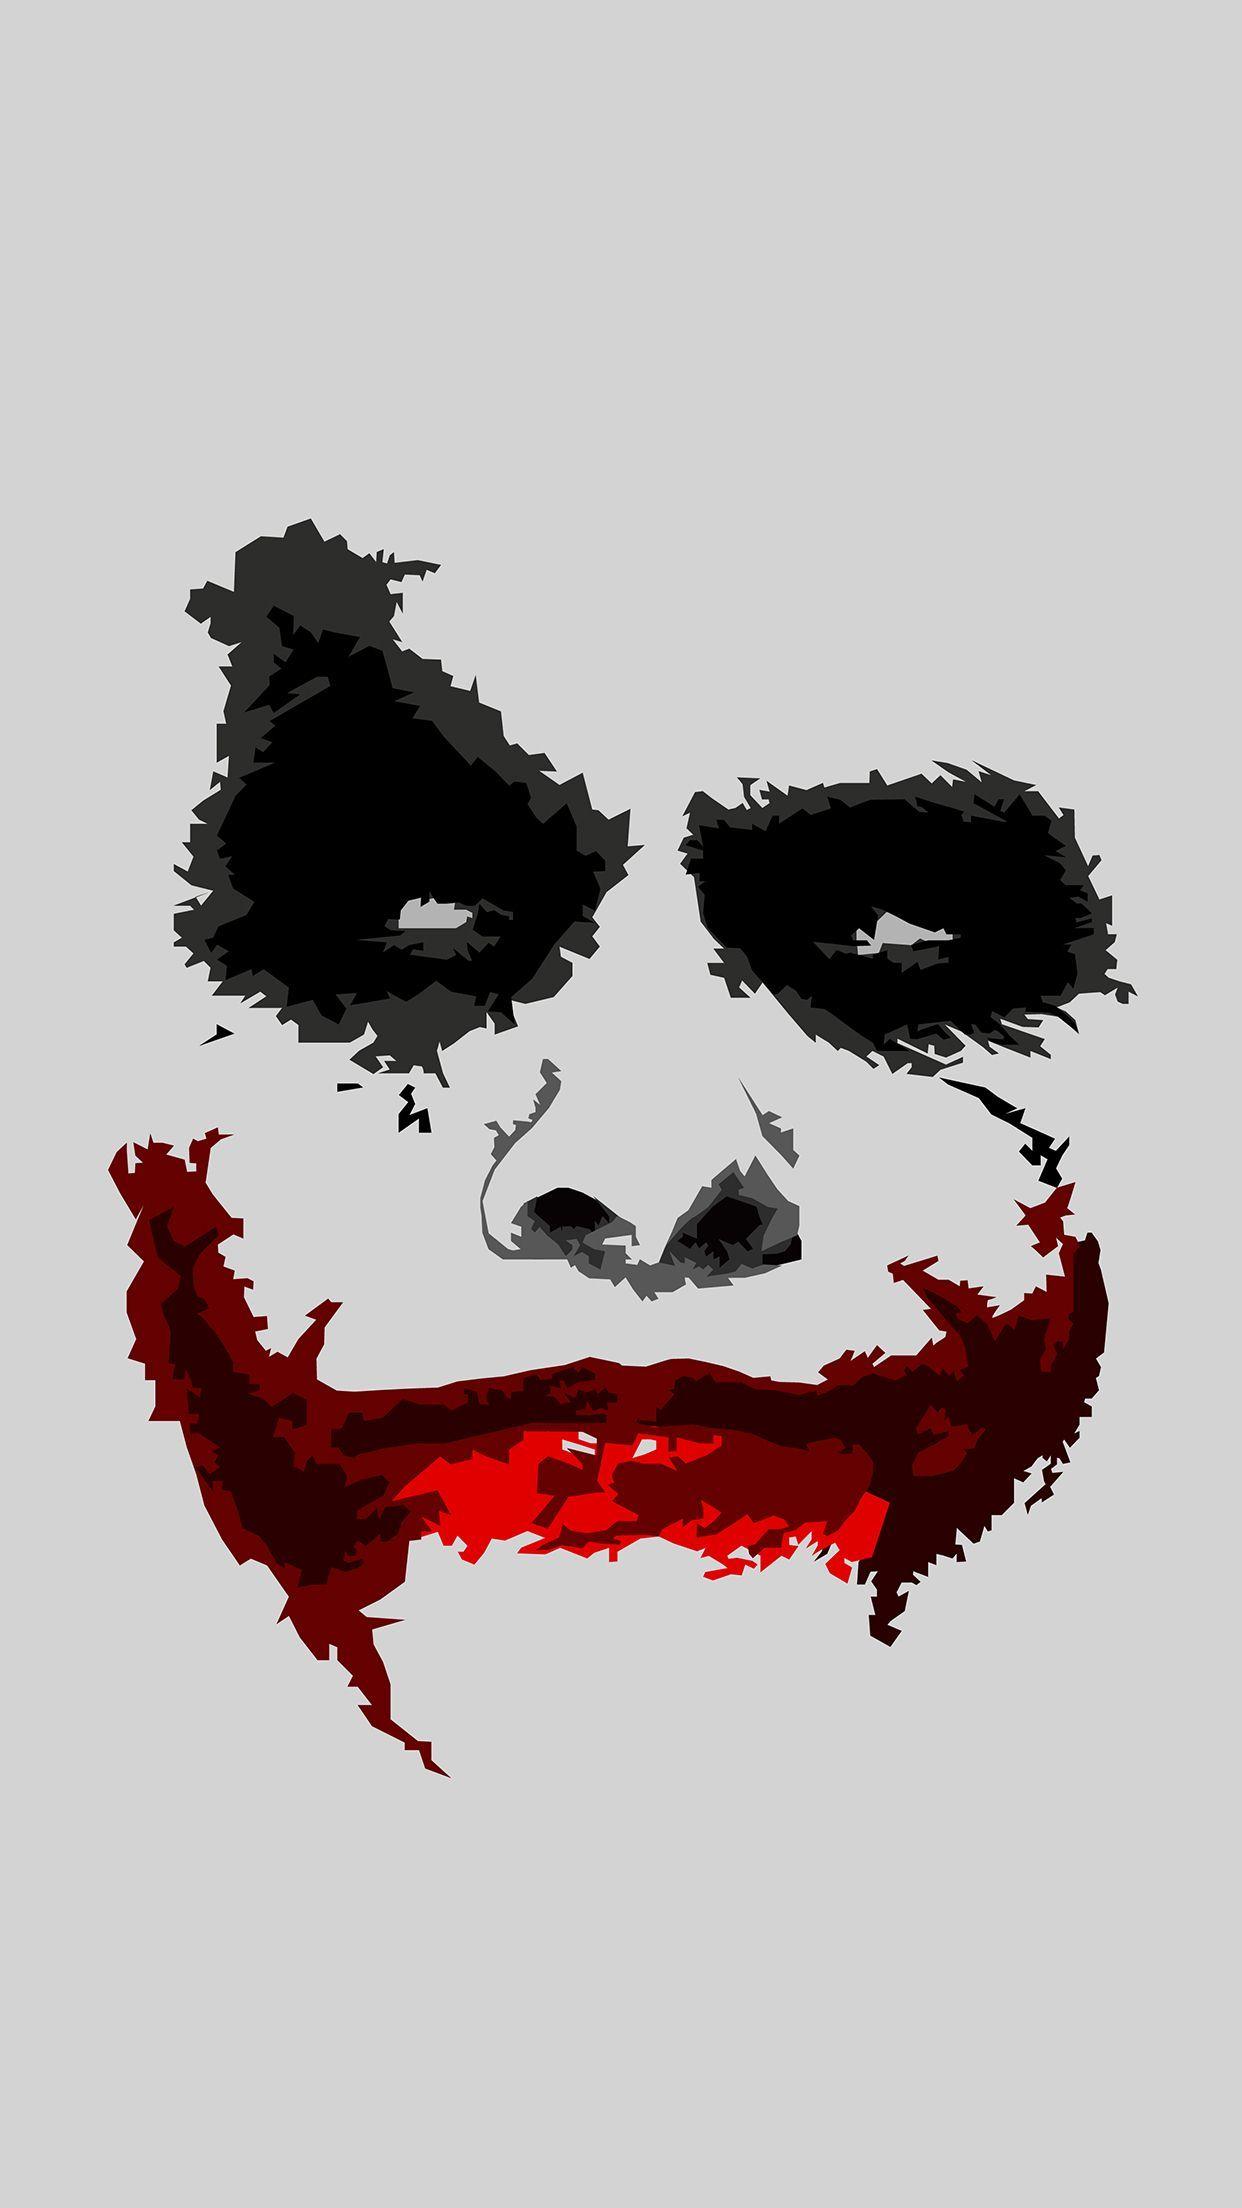 Joker Wallpaper Iphone Joker Iphone Wallpaper Joker Drawings Joker Wallpapers Iphone 6 images joker wallpaper 3d